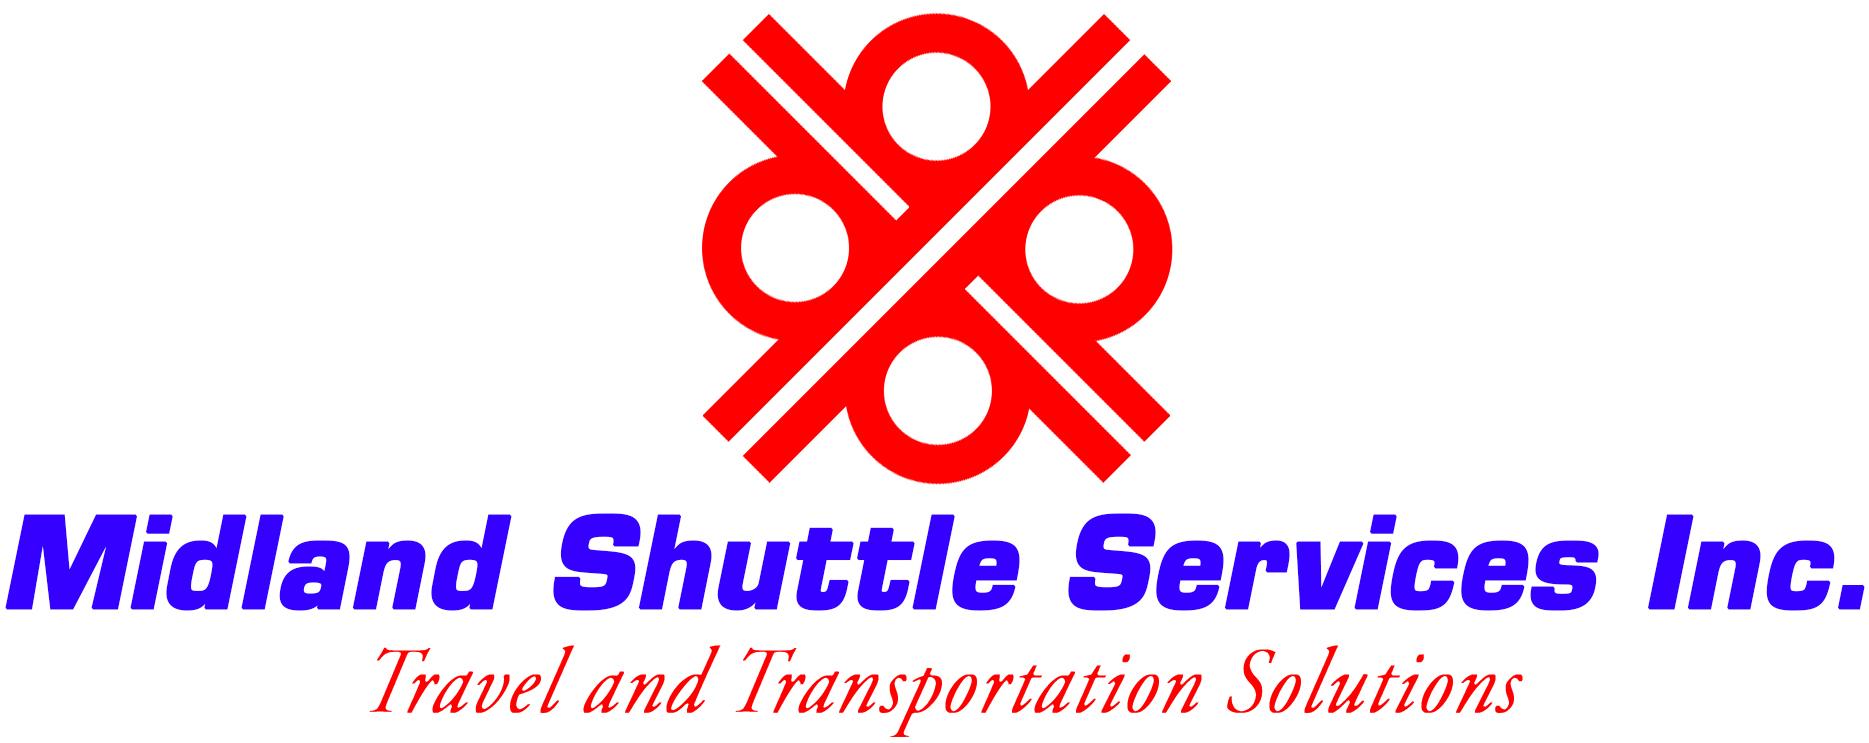 Midland Shuttle Services